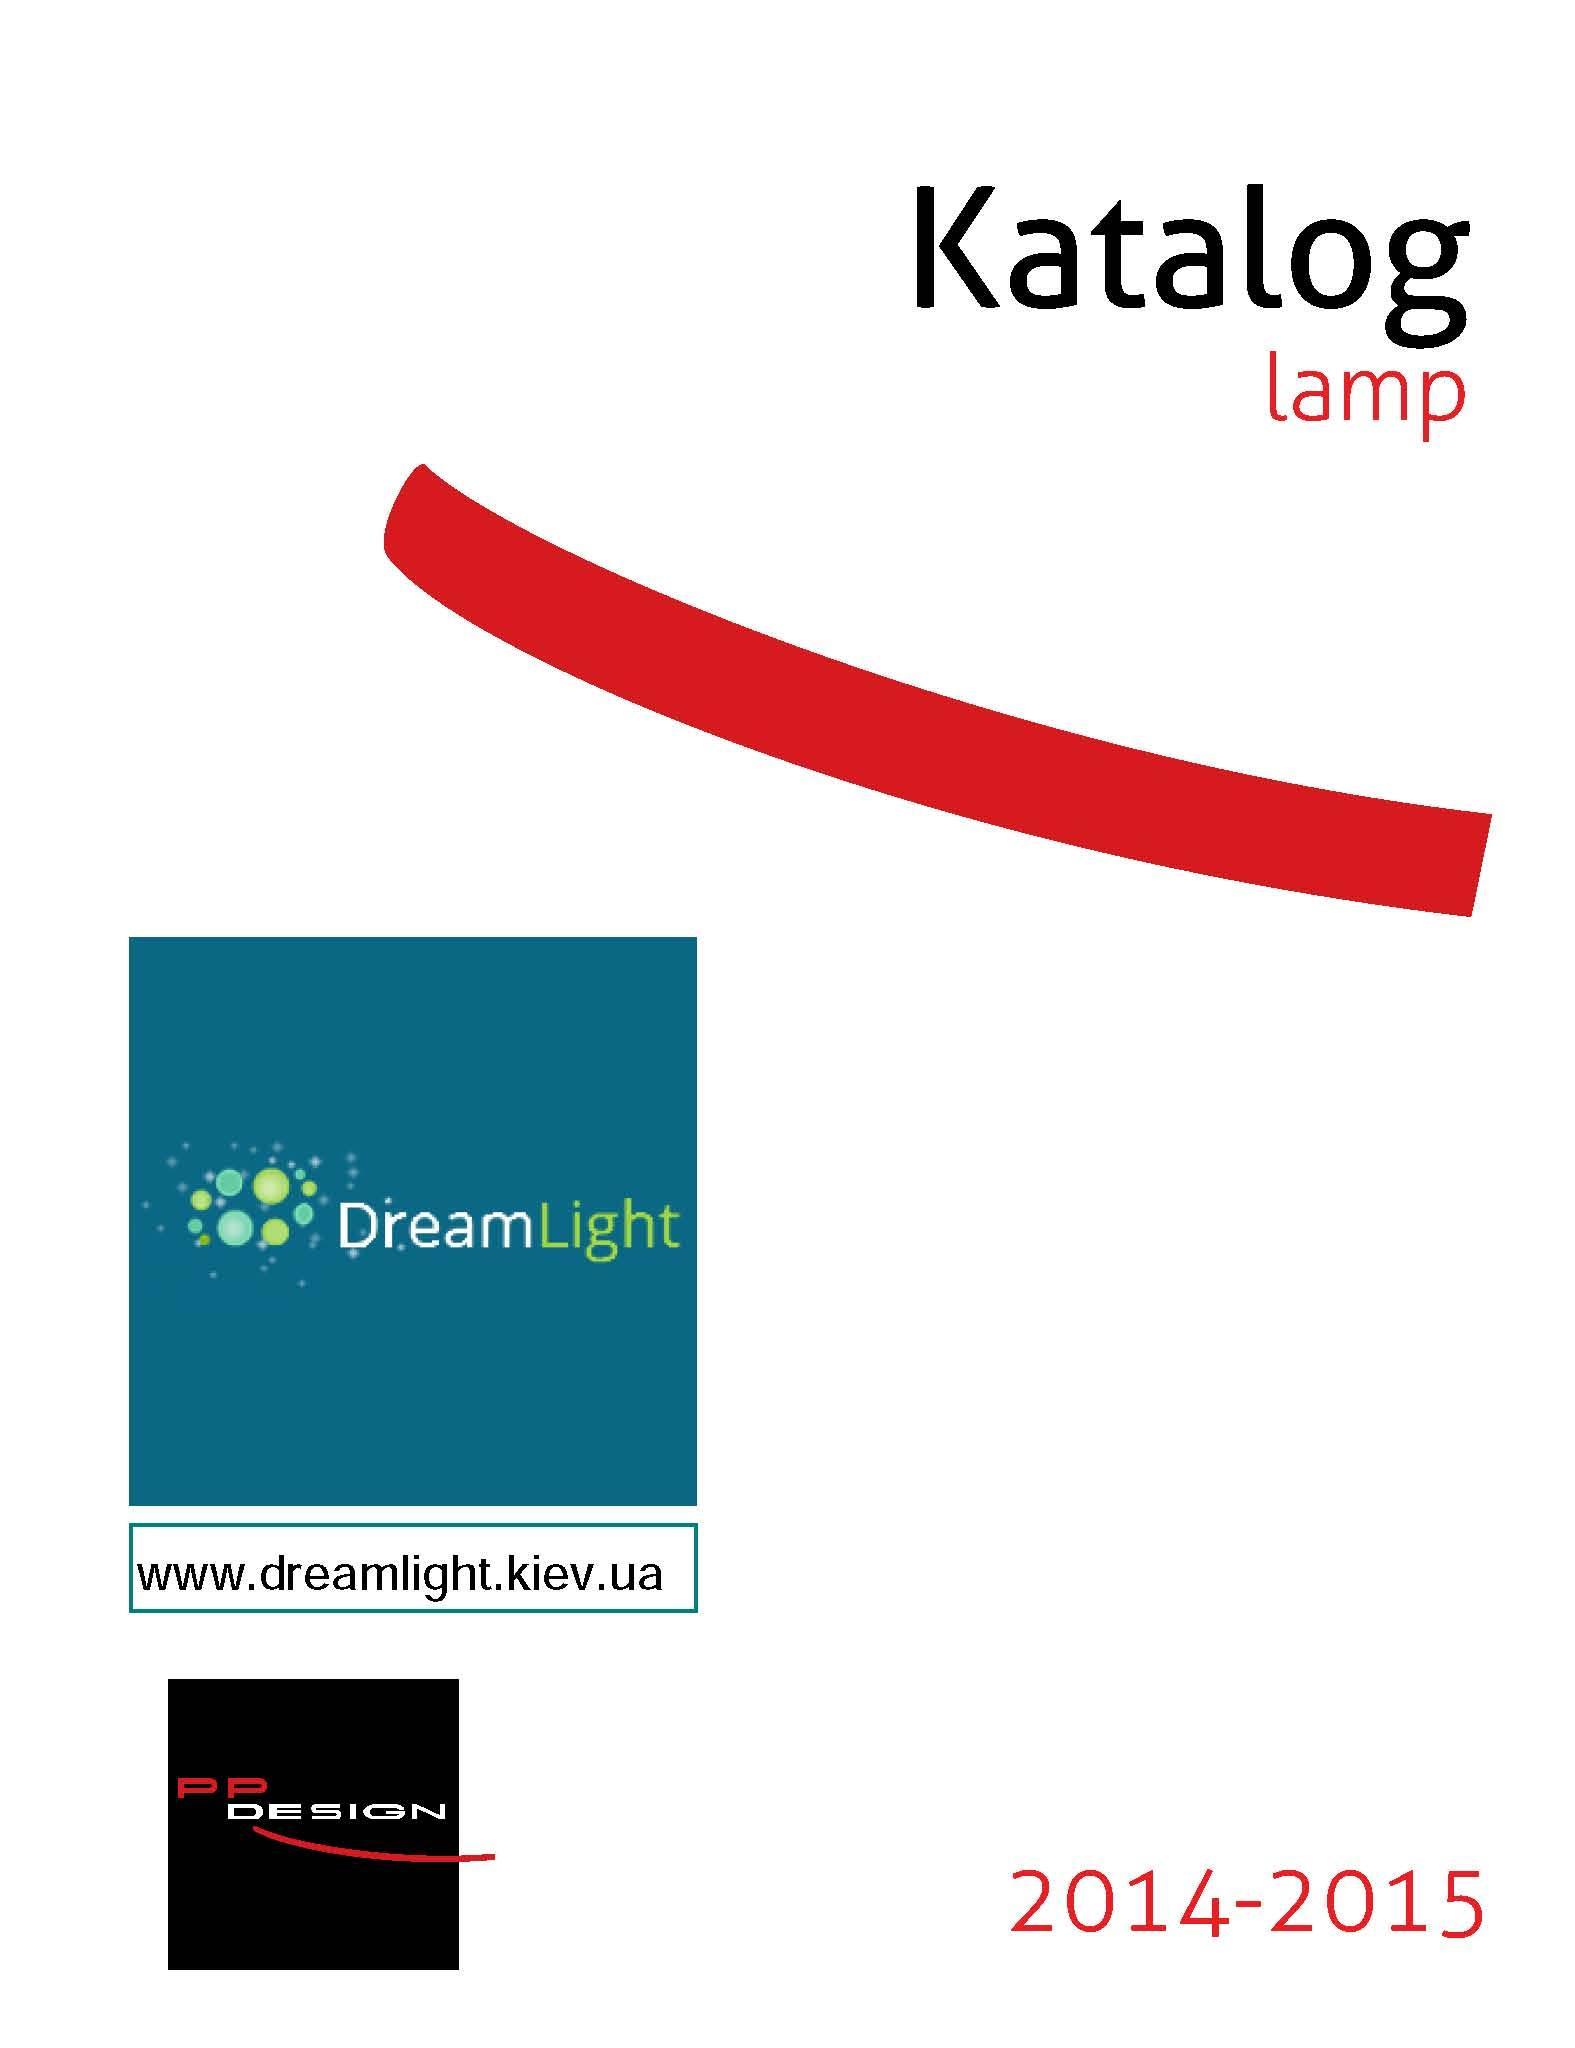 logo logo 标志 设计 图标 1575_2048 竖版 竖屏图片